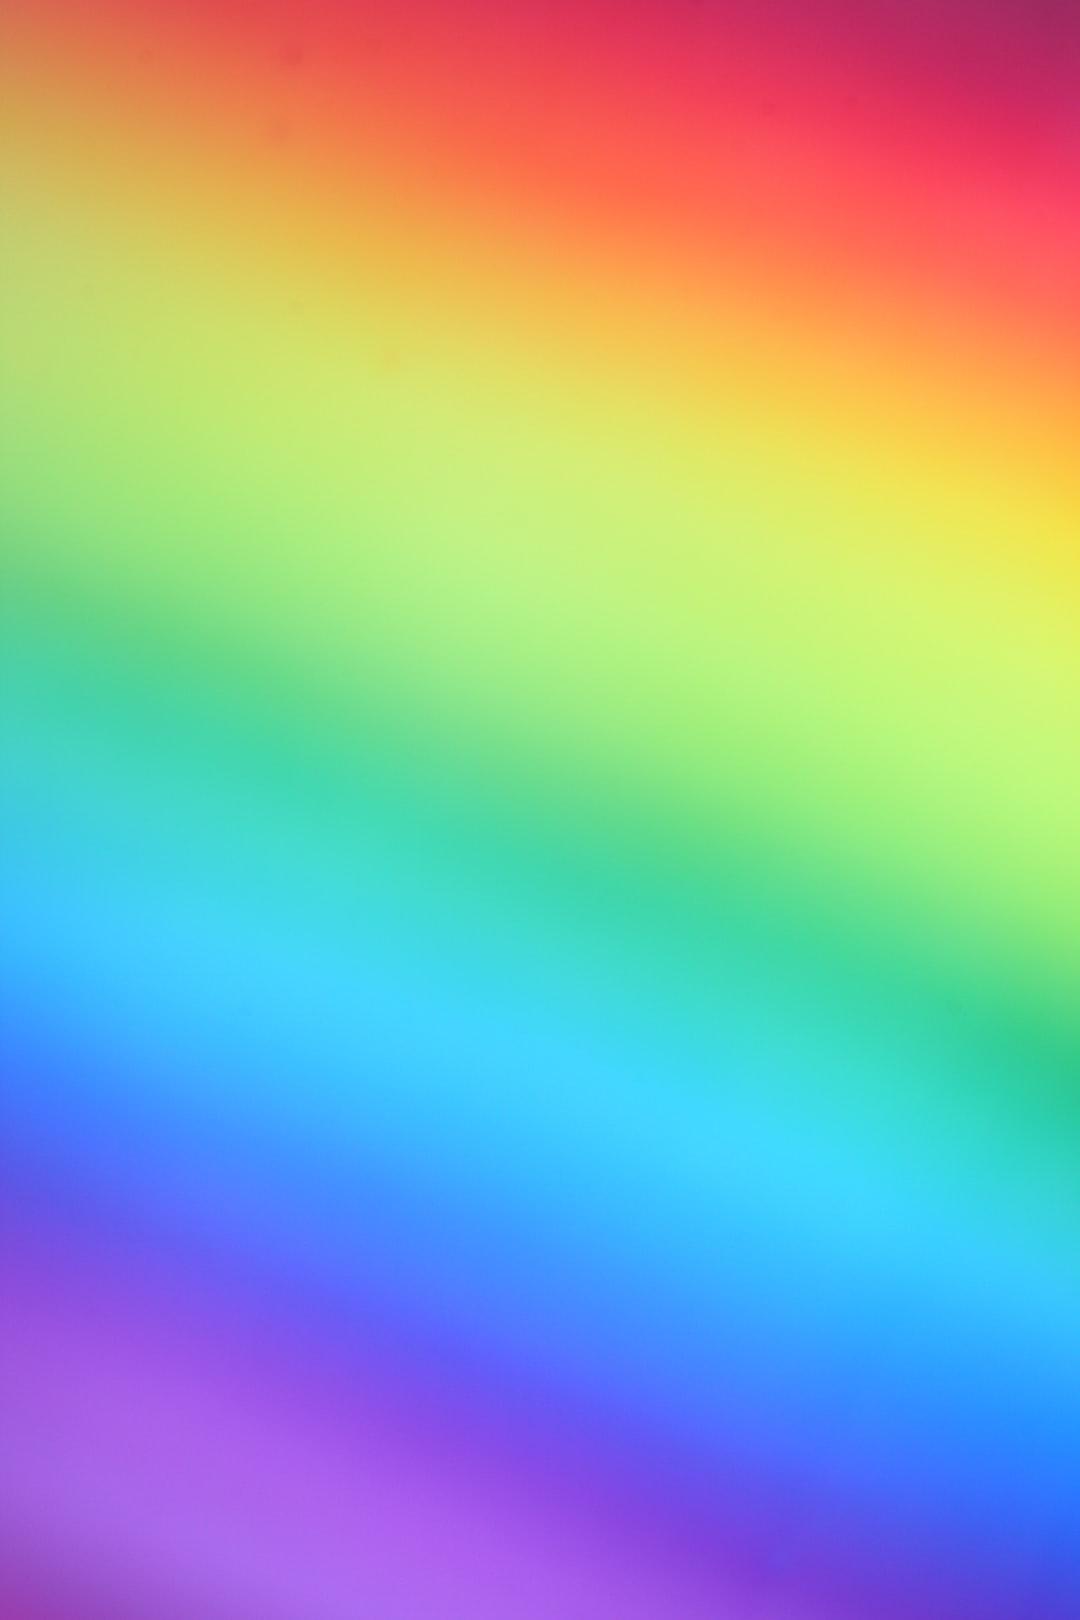 Rainbow mist background.